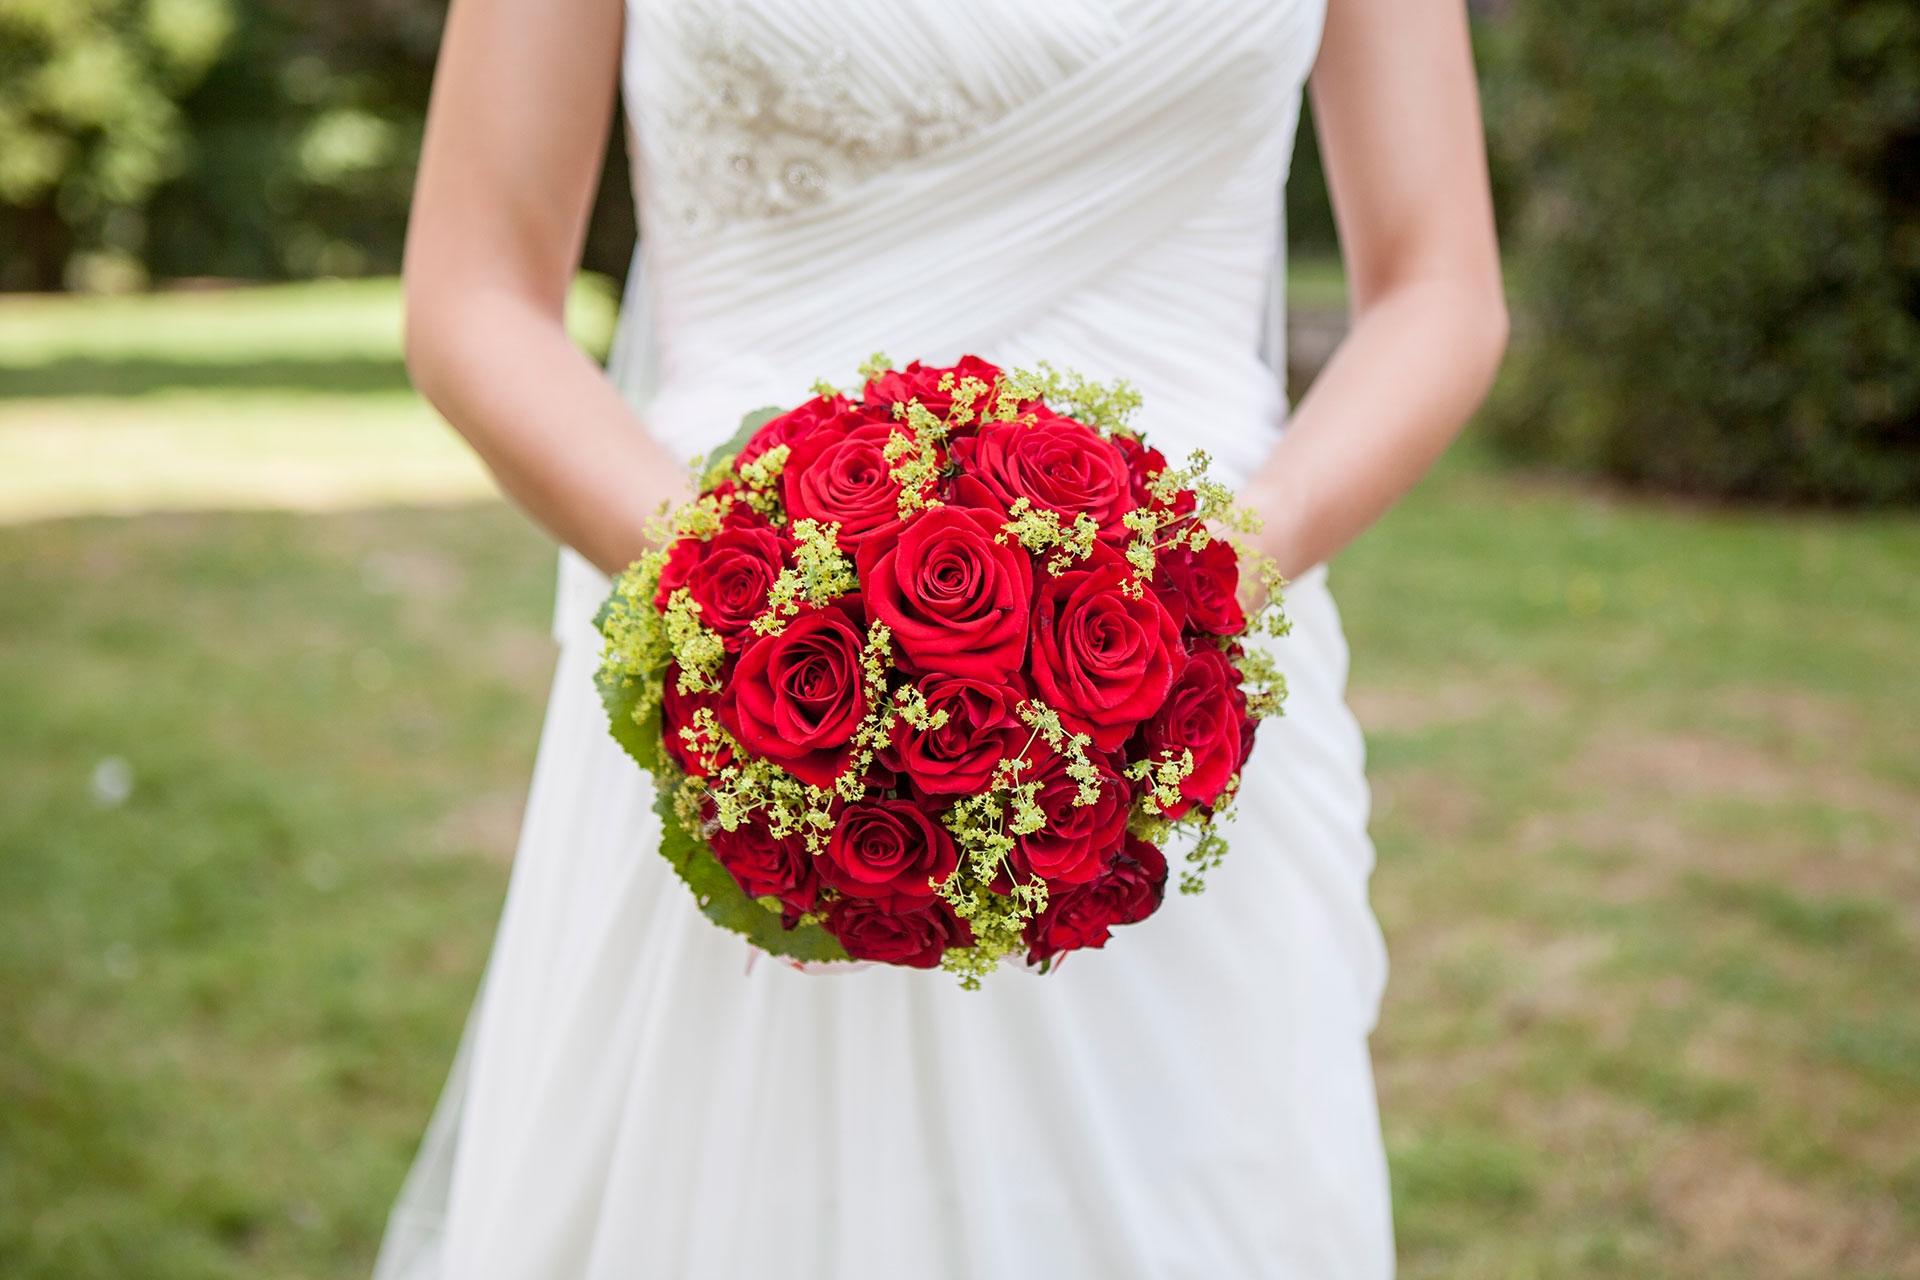 particuliers-evenements-mariages-oui-aurelie&geoffrey-30